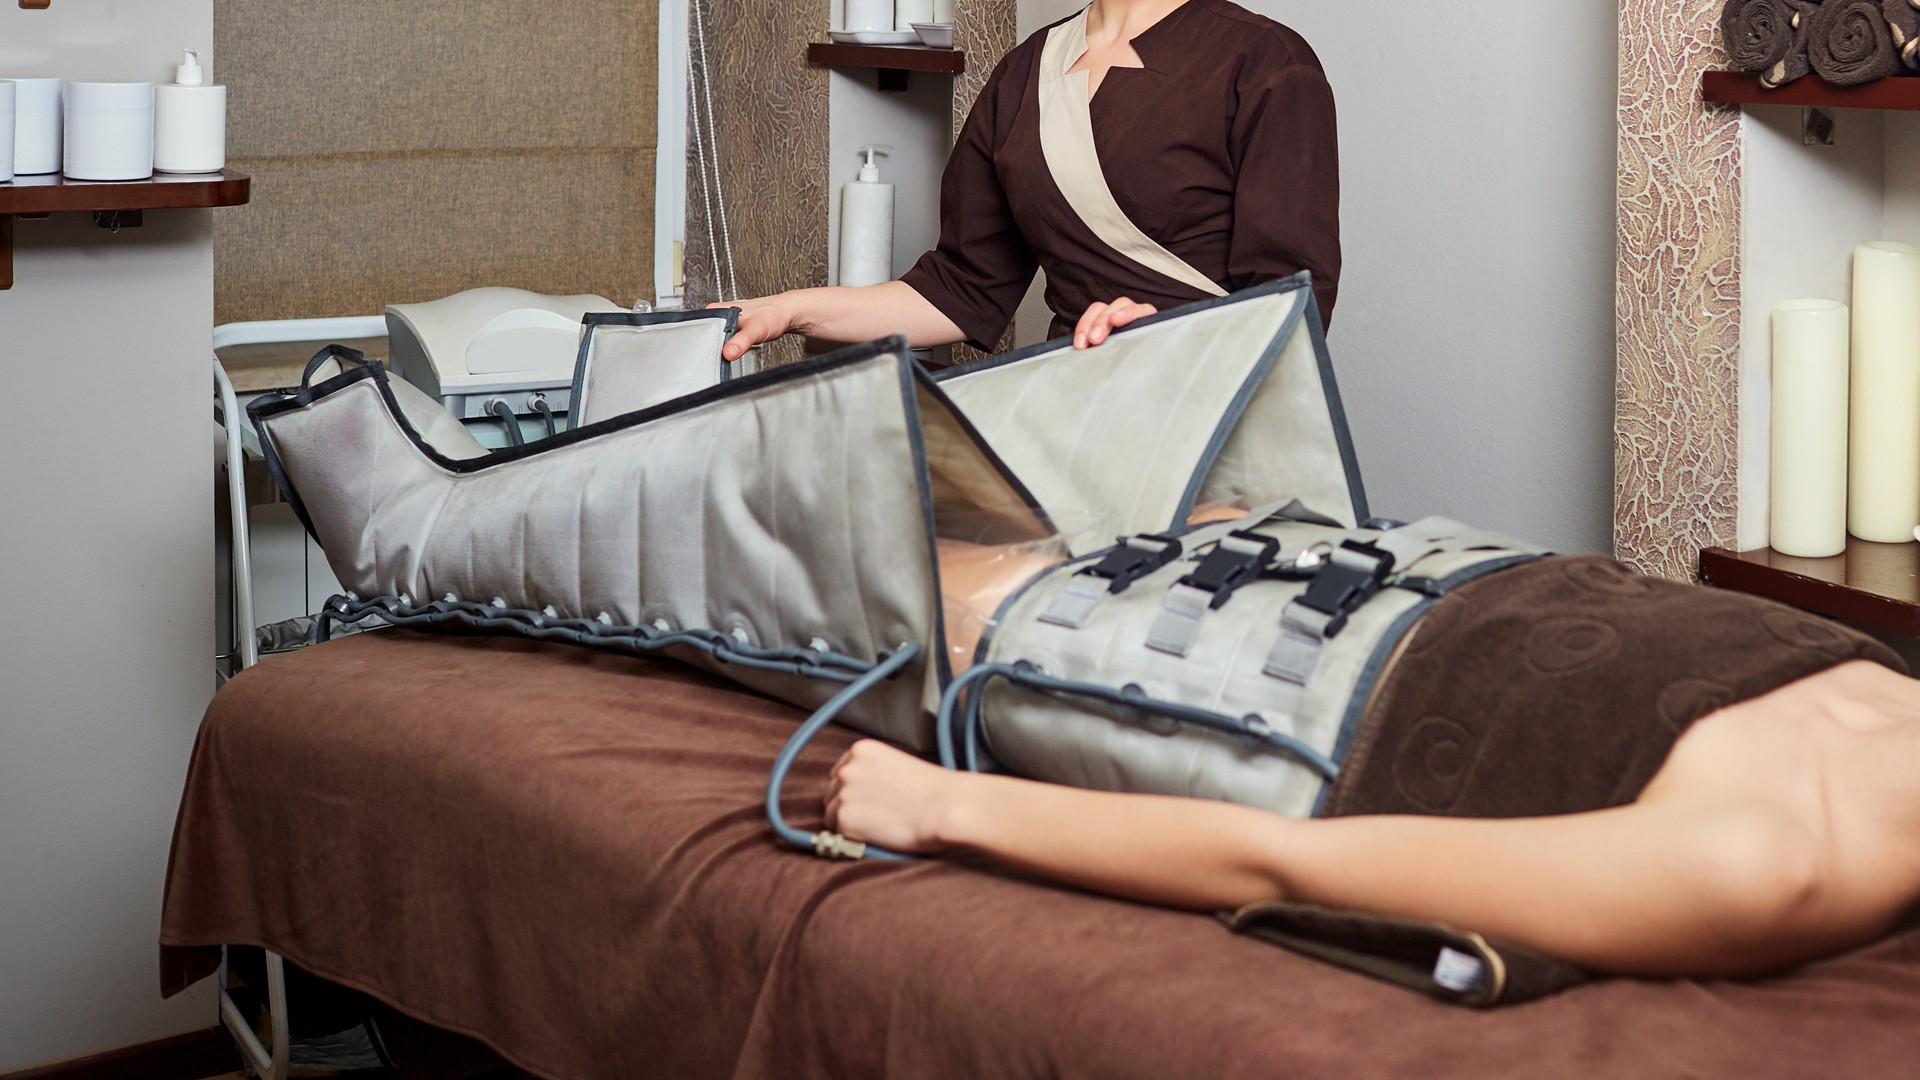 000 presoterapia belleza estetica